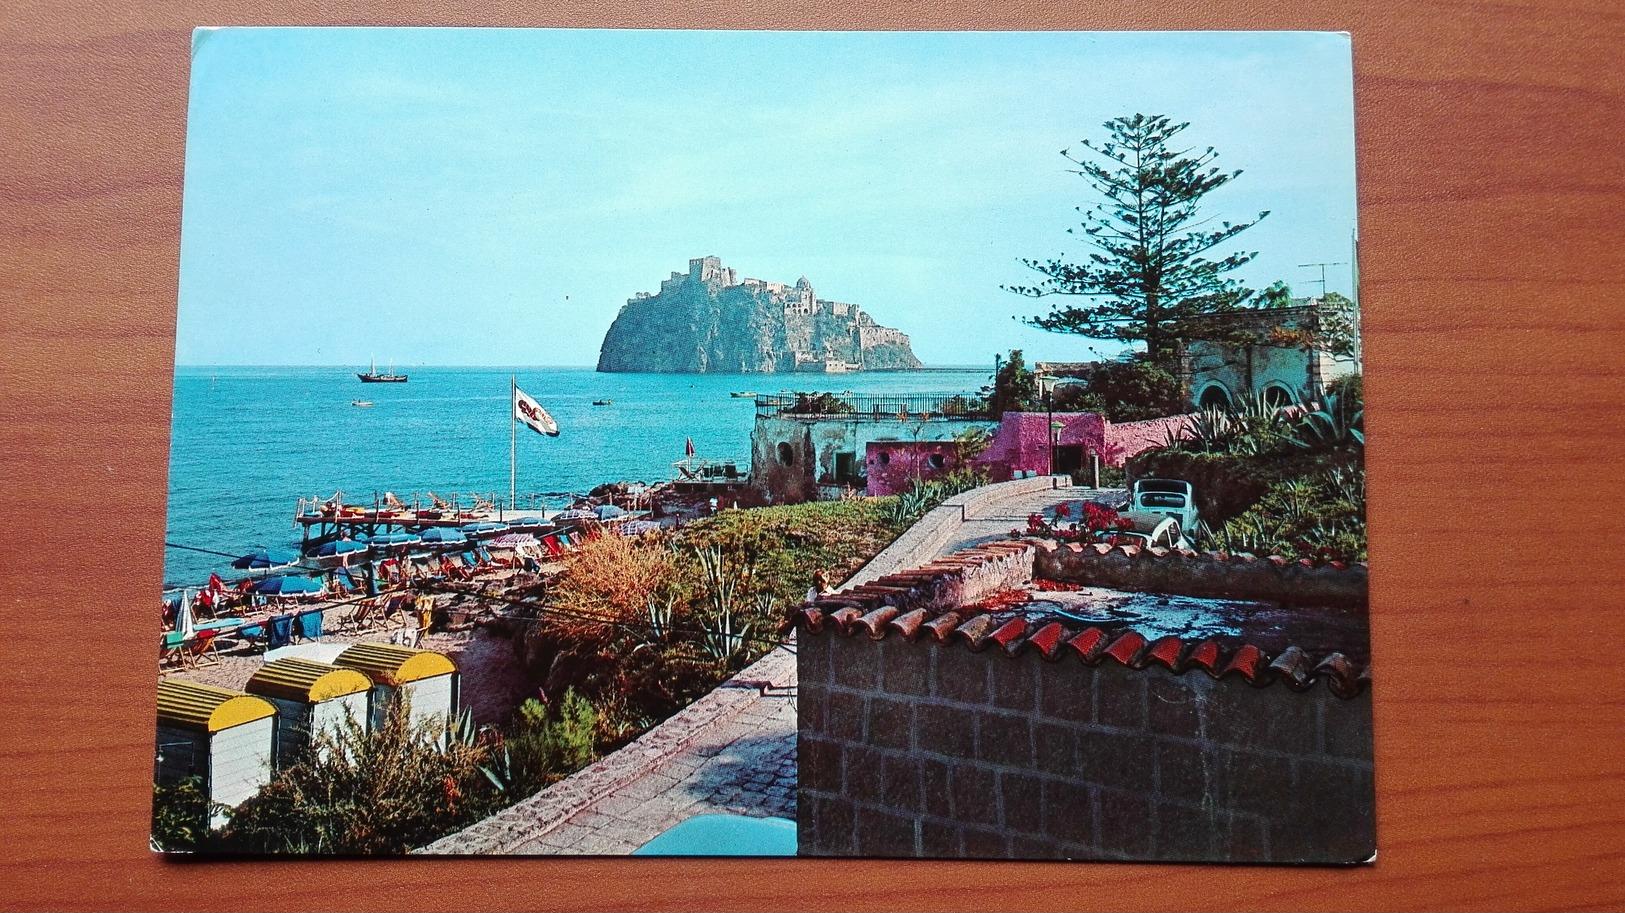 Isola D'Ischia - Ponte , Spiaggia Dei Pescatori E Castello - Napoli (Naples)